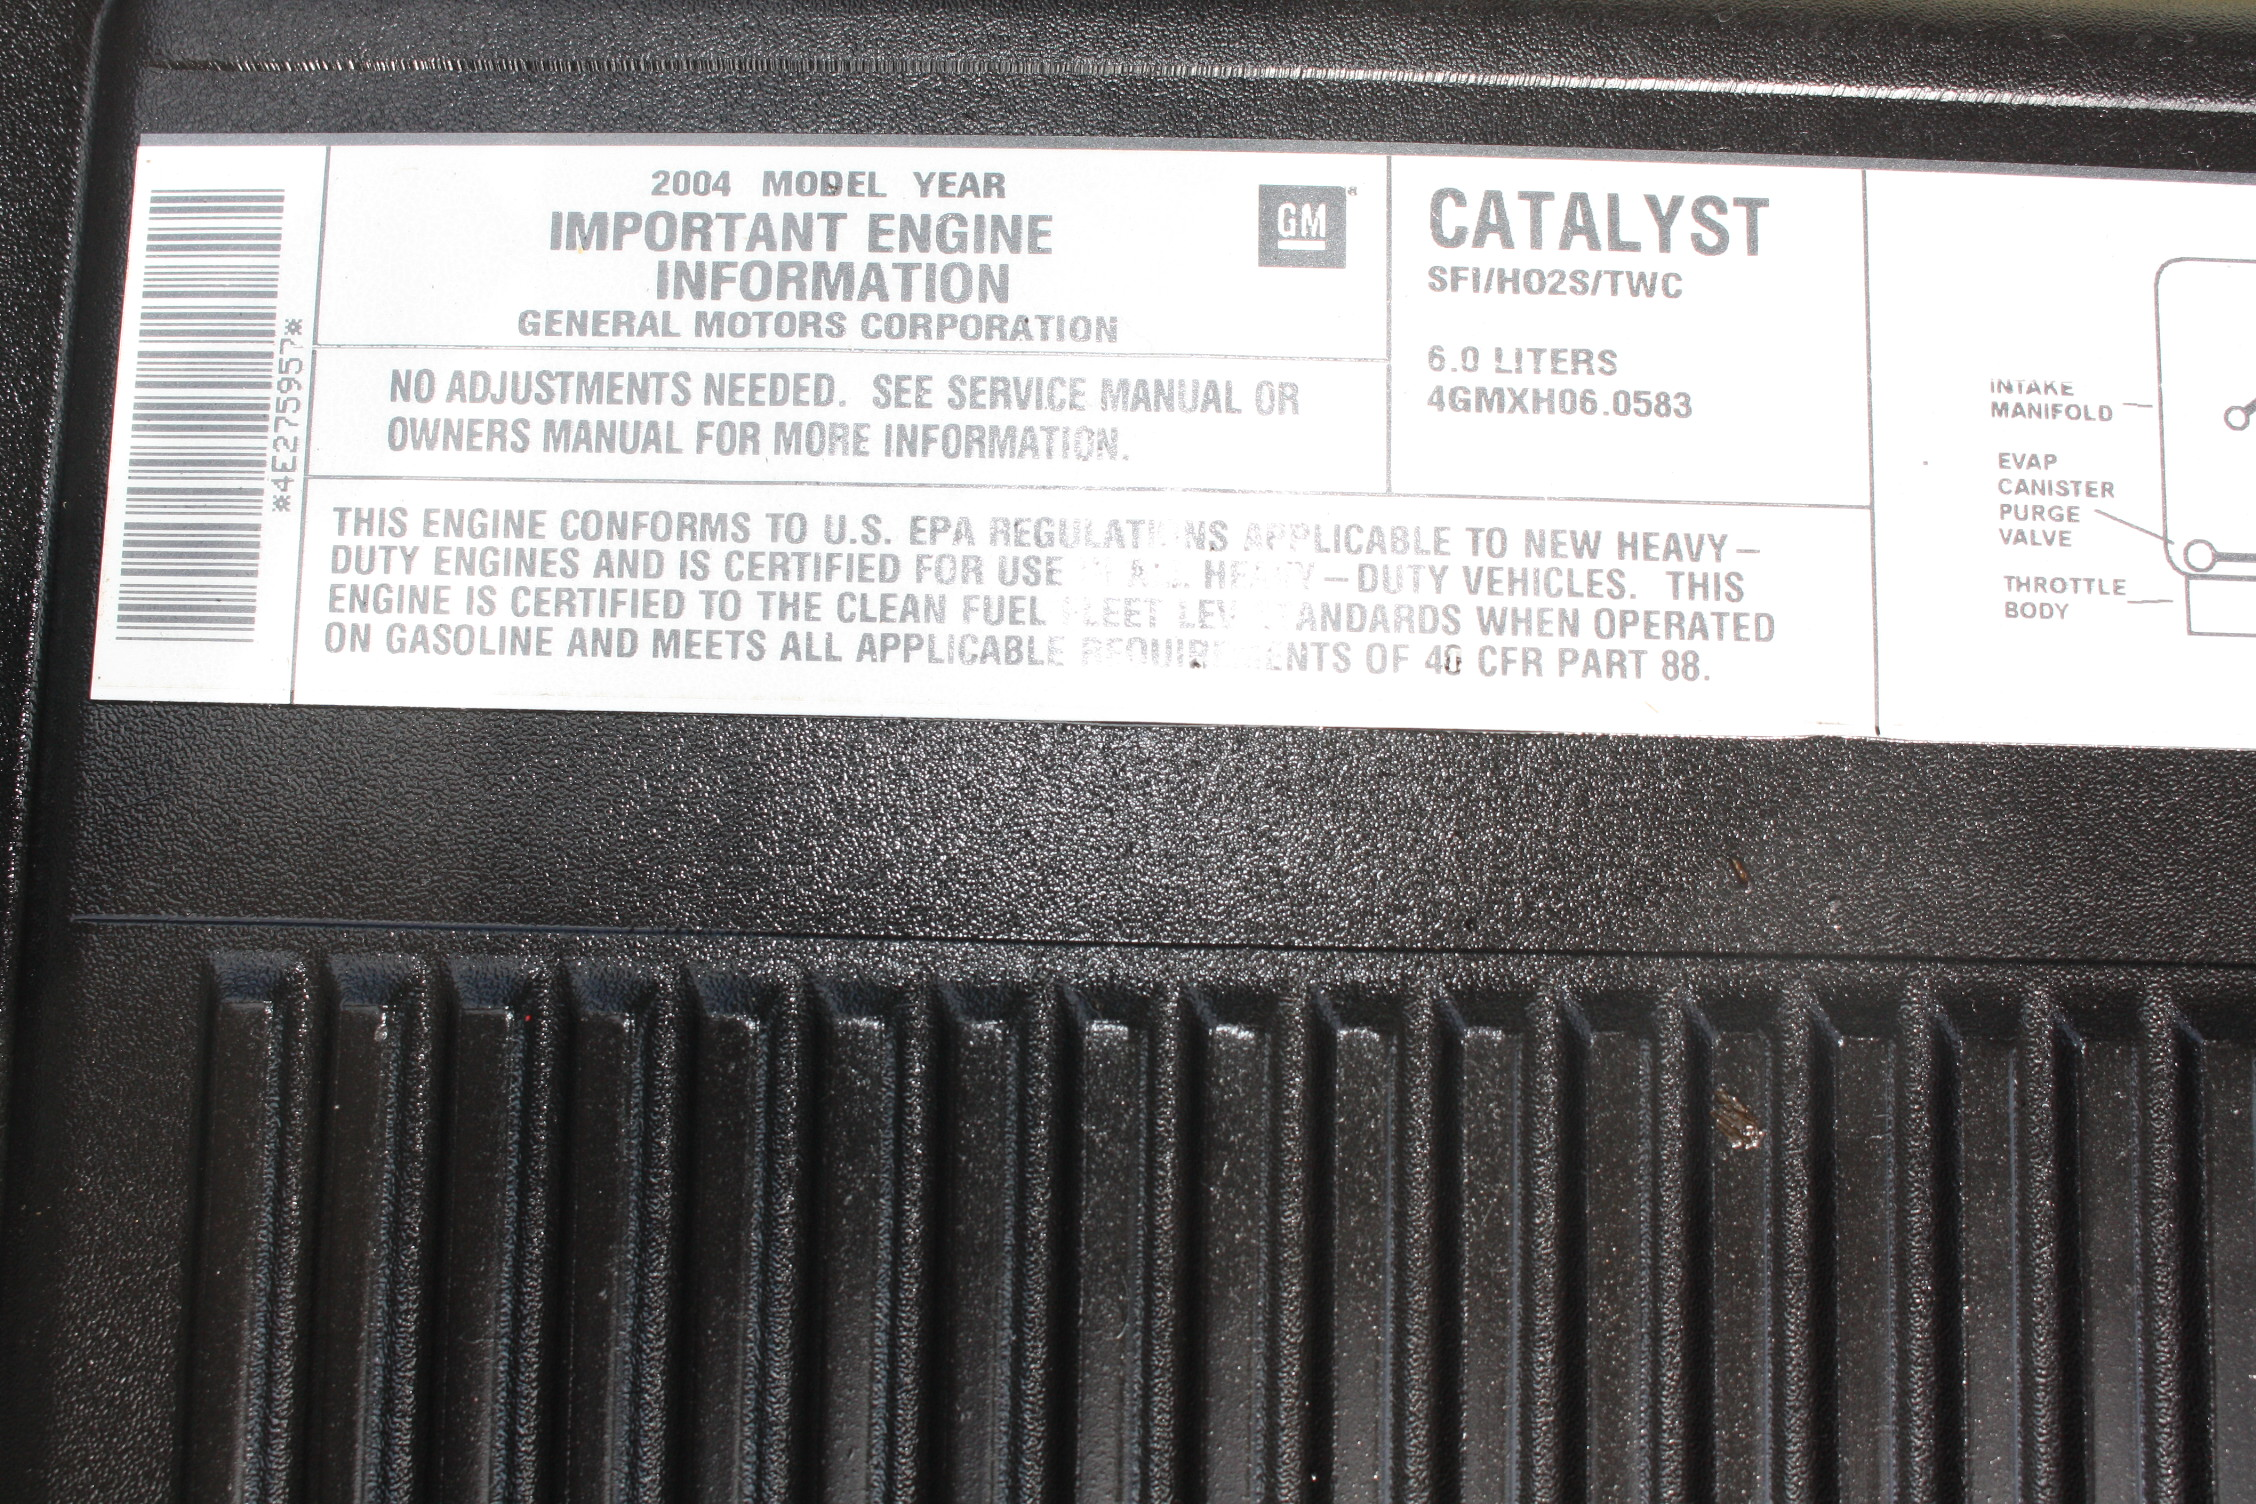 2004 CHEVROLET SILVERADO K3500 4x4